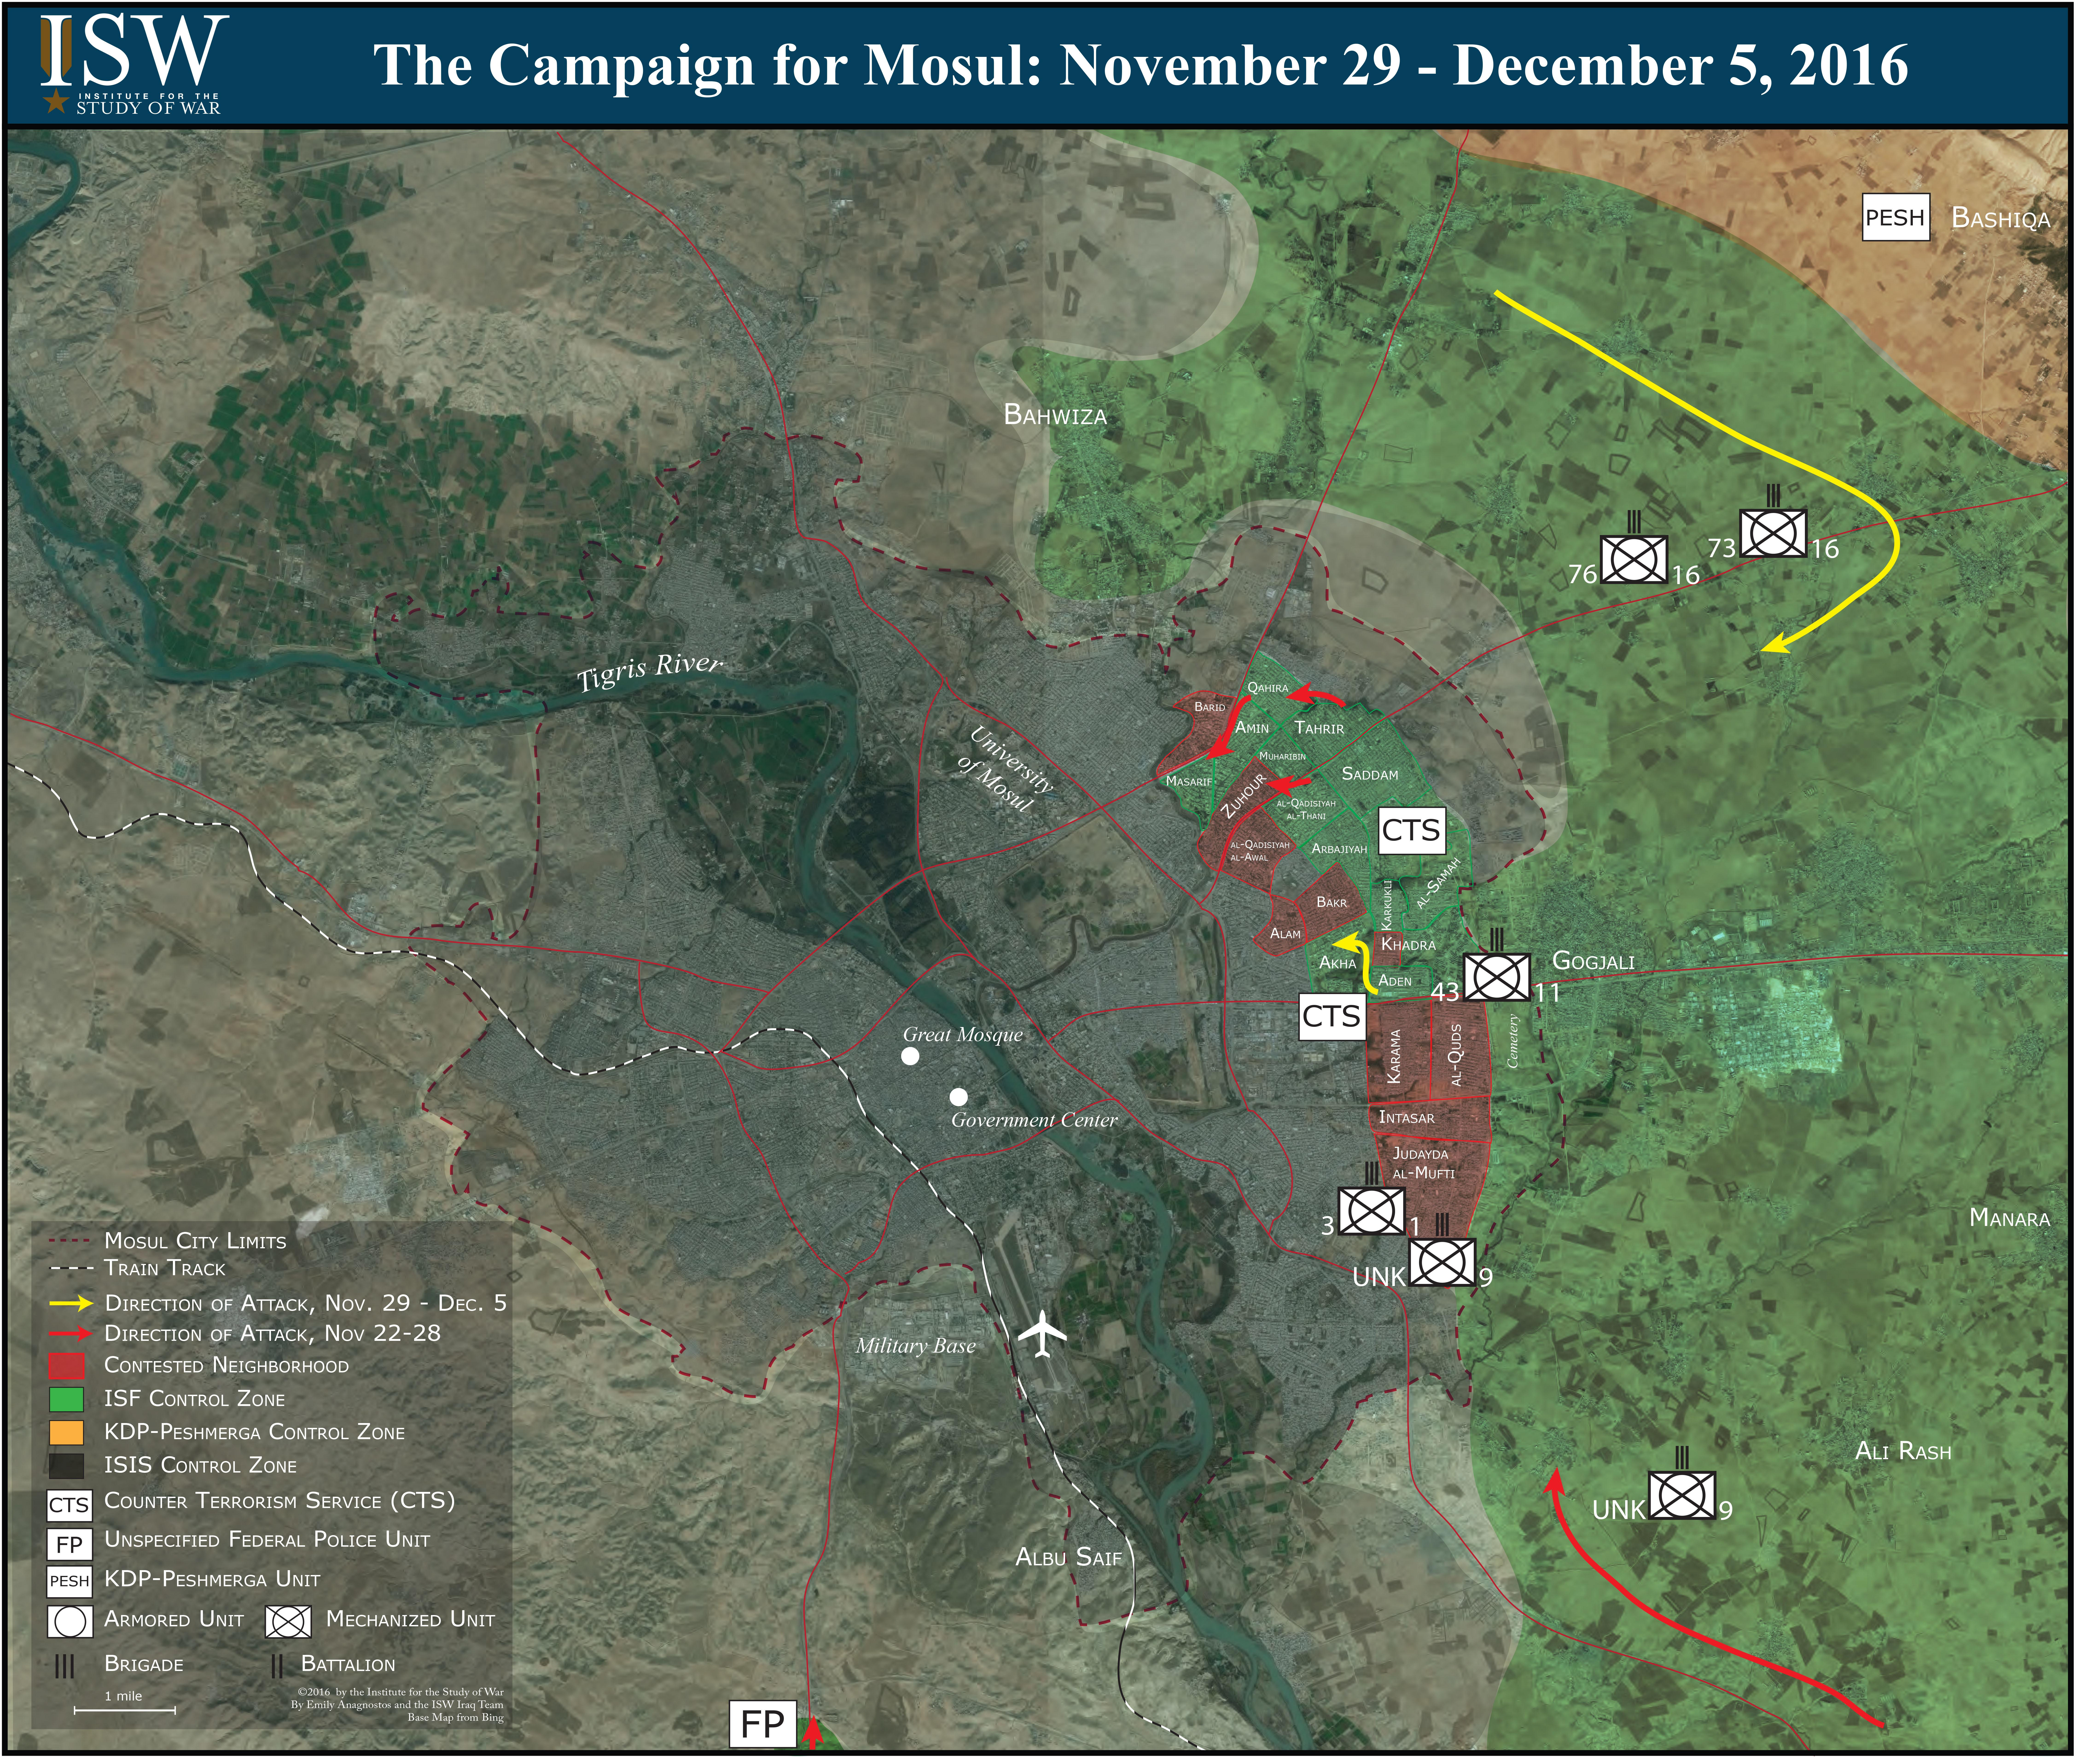 Mosul City Campaign Nov 29 DEC 5 PDF reduced